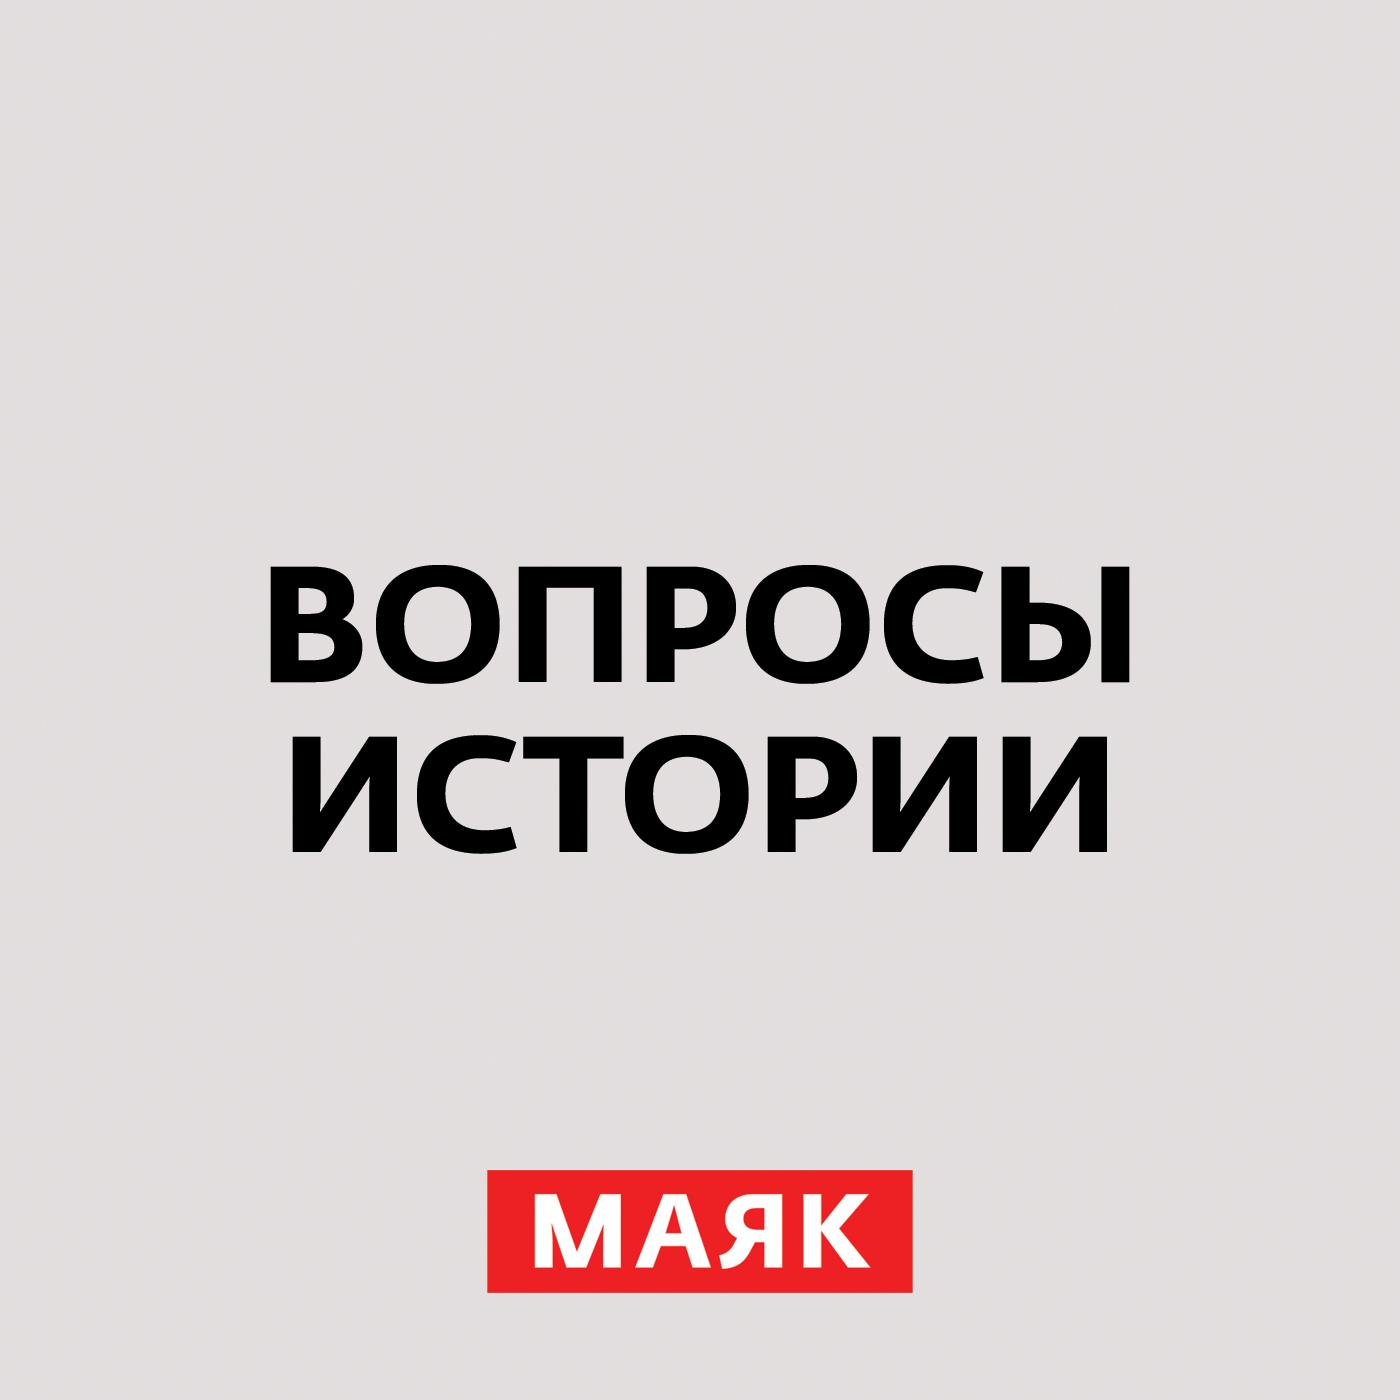 Андрей Светенко Осень 1941-го: Крещатик и Бабий Яр. Часть 1 кузнецов анатолий васильевич бабий яр